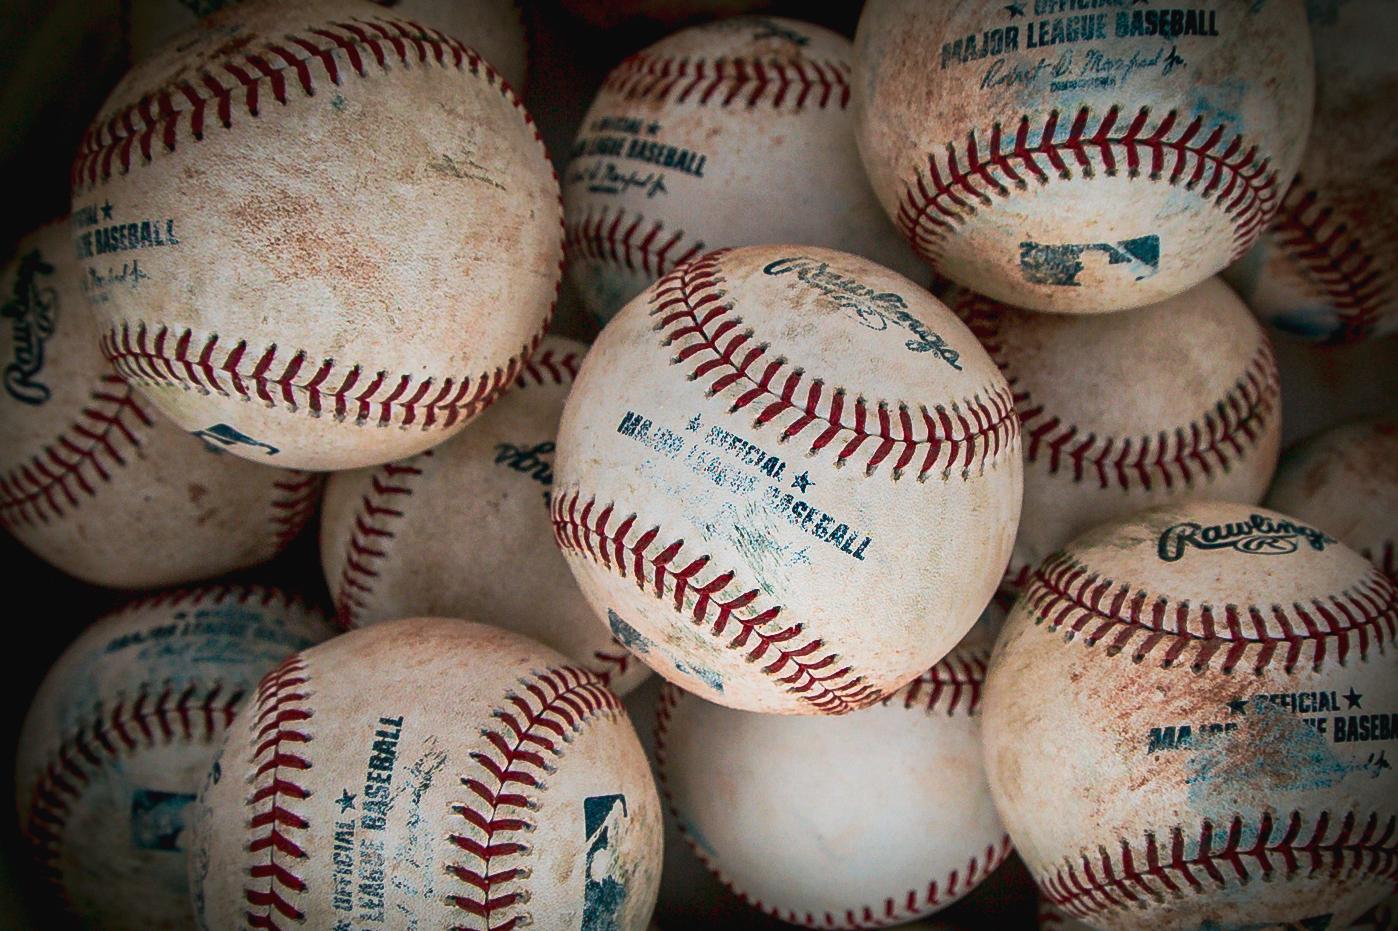 Kansas City Royals: Top 12 prospects heading into 2020